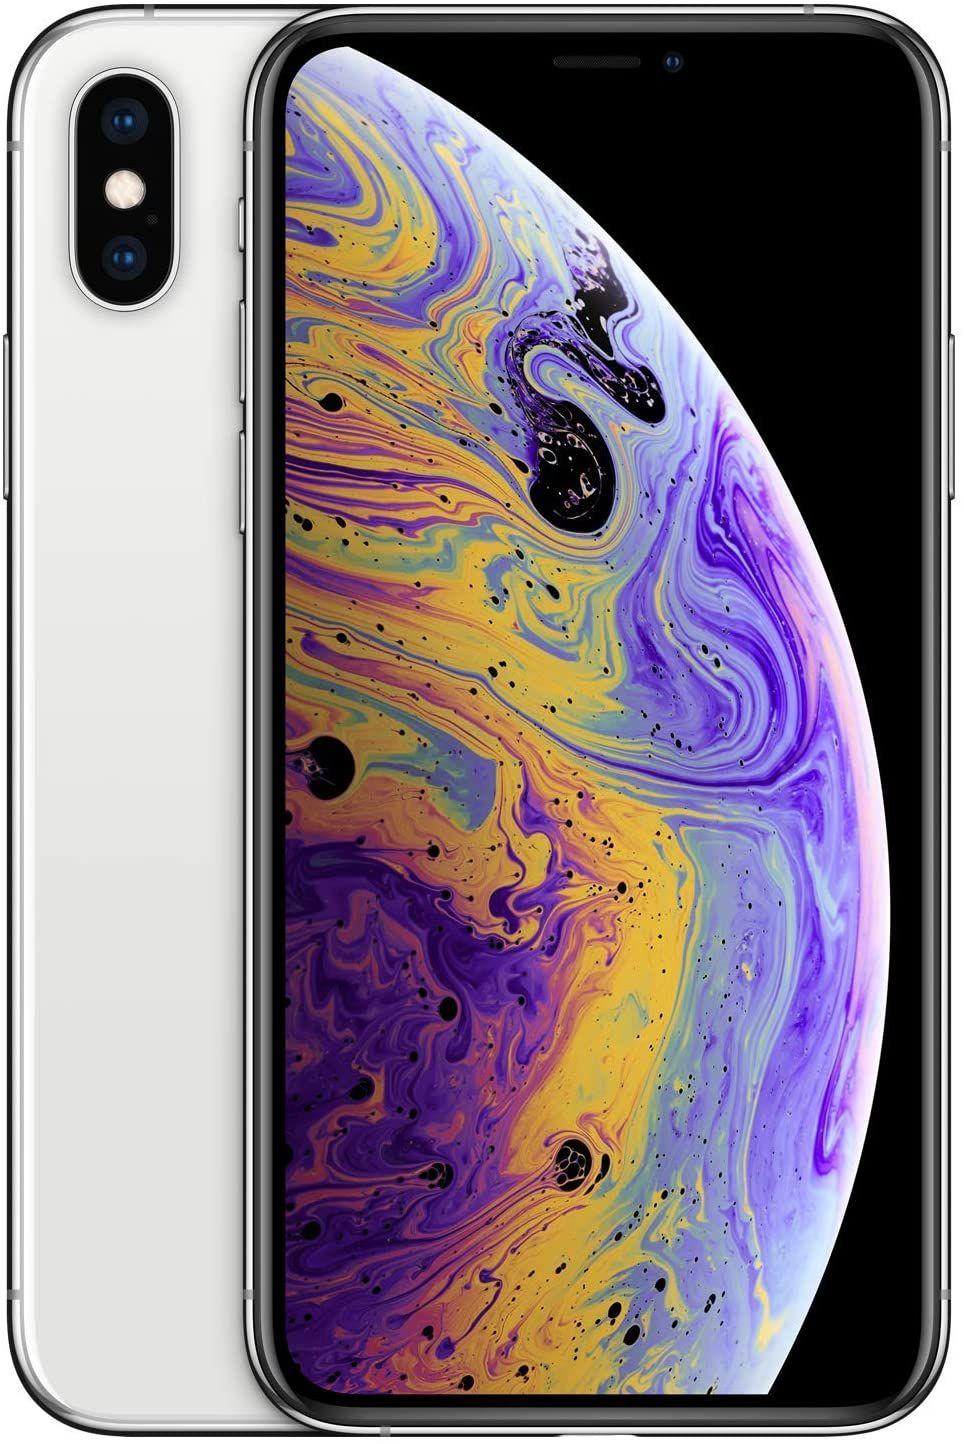 "Apple iPhone XS 256GB Silber (5,8"" FHD+ OLED, 177g, 4/512GB, A12, Dual-SIM, NFC, 2658mAh, 10W, AnTuTu 357k) [V&V Amazon]"